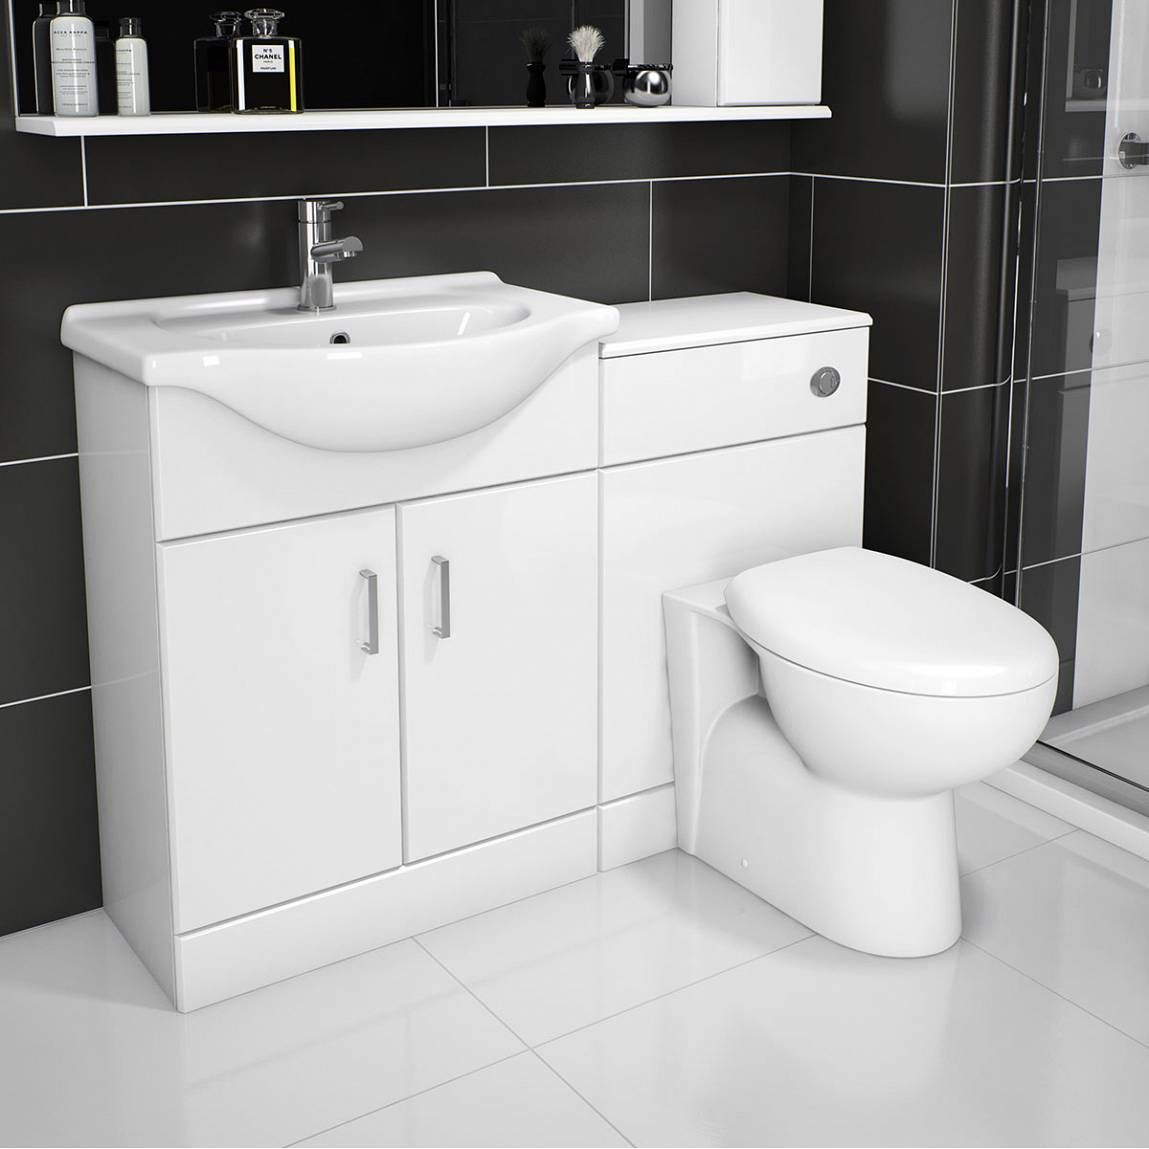 Sienna Milo White Gloss Combination Vanity Unit Small Bathroom Layout Bathroom Furniture Bathroom